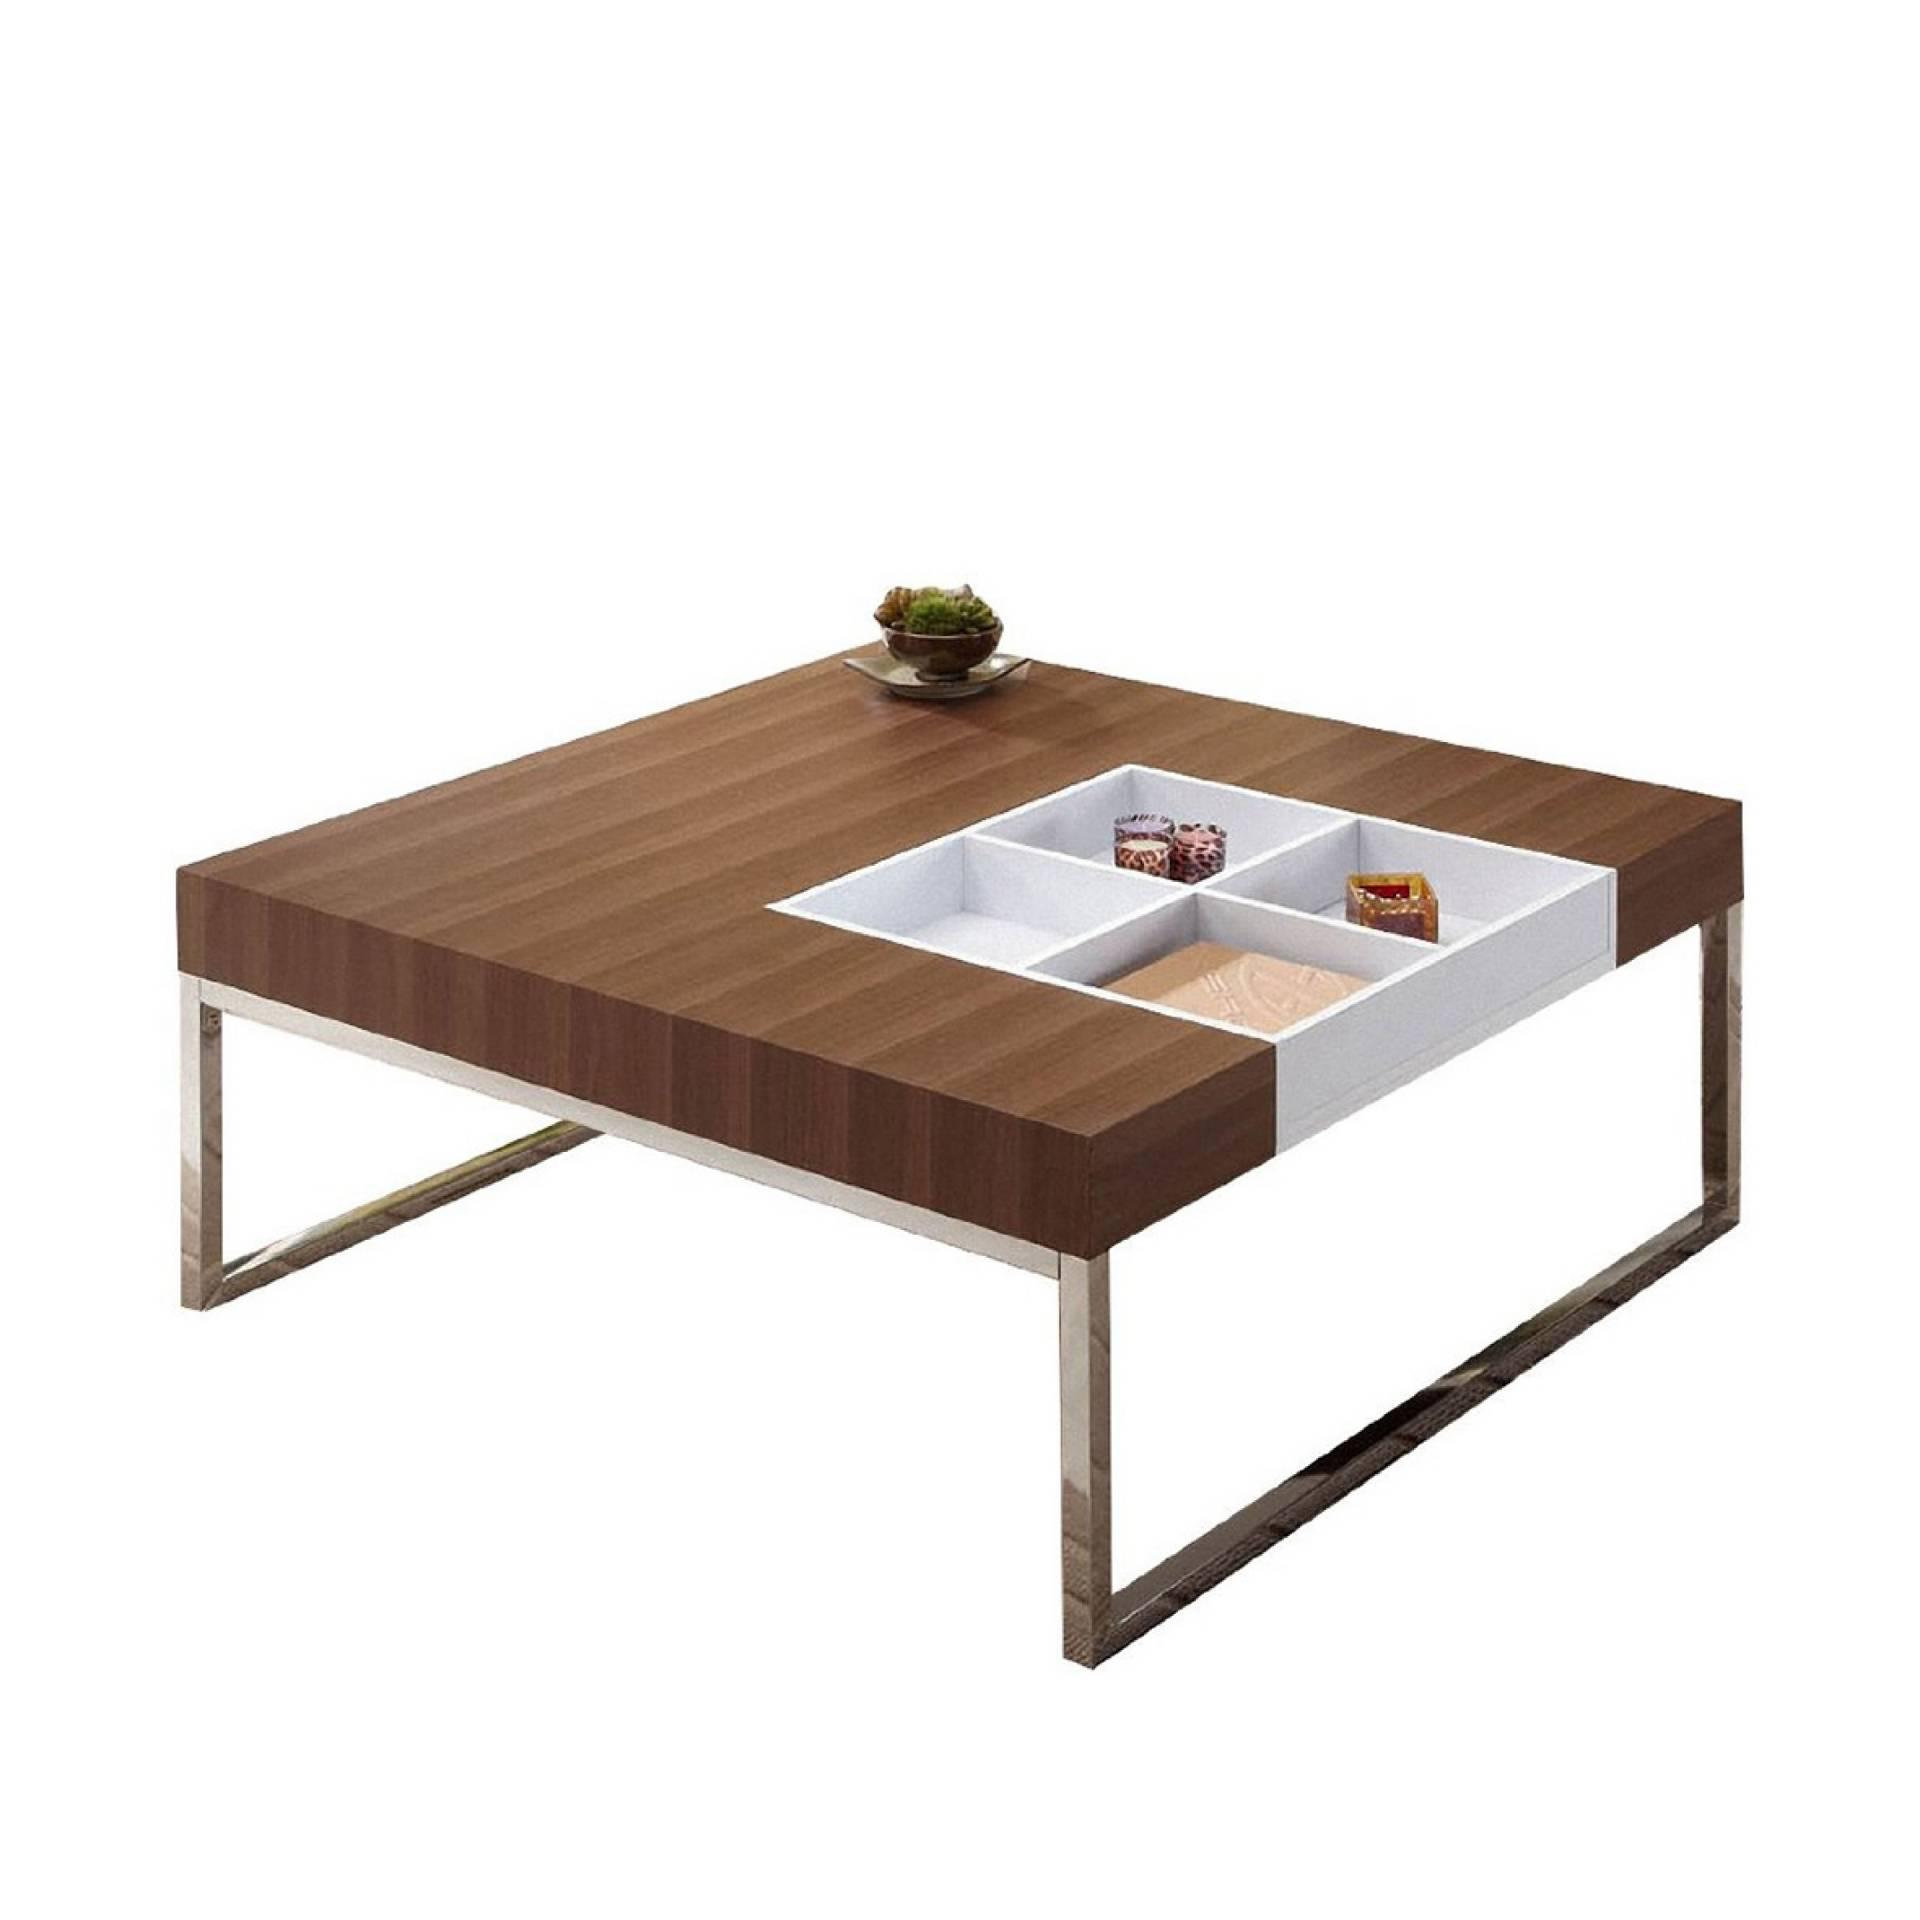 table basse carr e fabricants de meubles de maison slicethinner. Black Bedroom Furniture Sets. Home Design Ideas